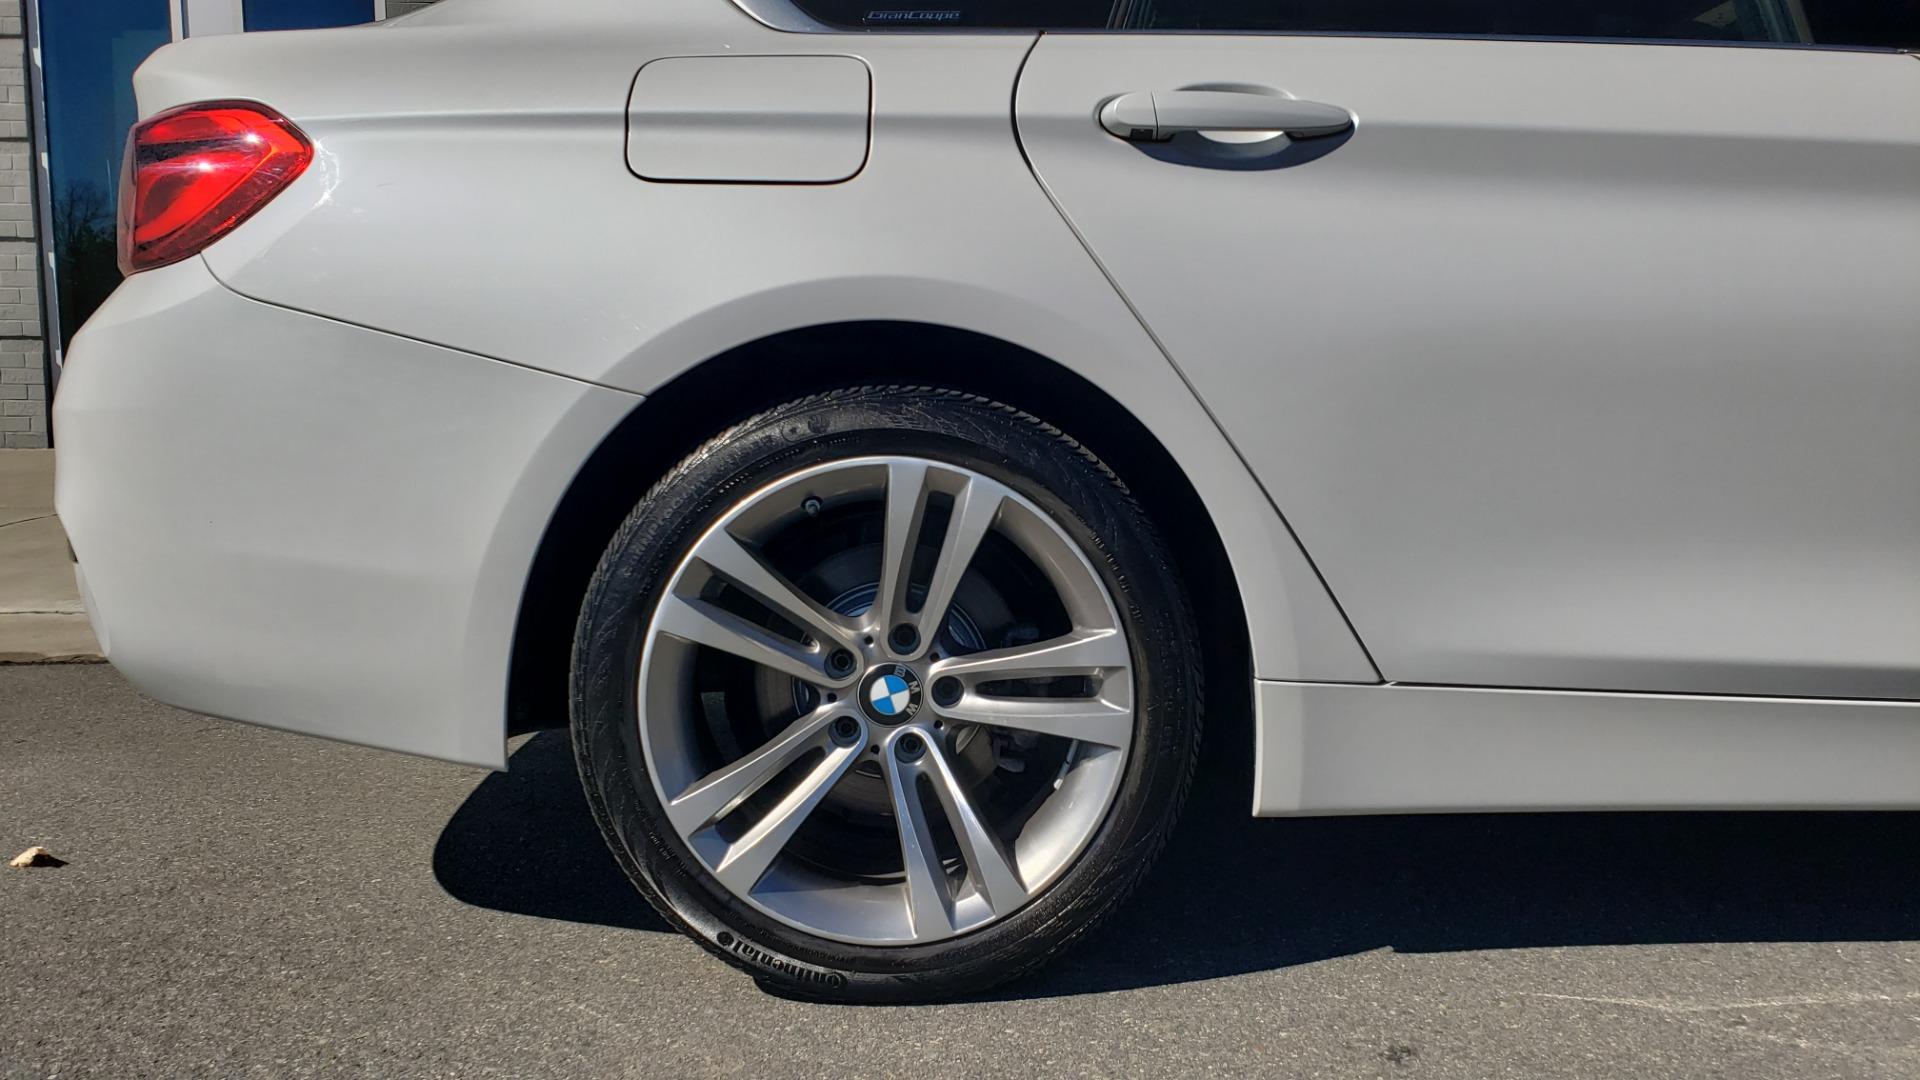 Used 2018 BMW 4 SERIES 430IXDRIVE / PREMIUM / NAV / SUNROOF / ESSENTIALS PKG for sale $27,795 at Formula Imports in Charlotte NC 28227 84